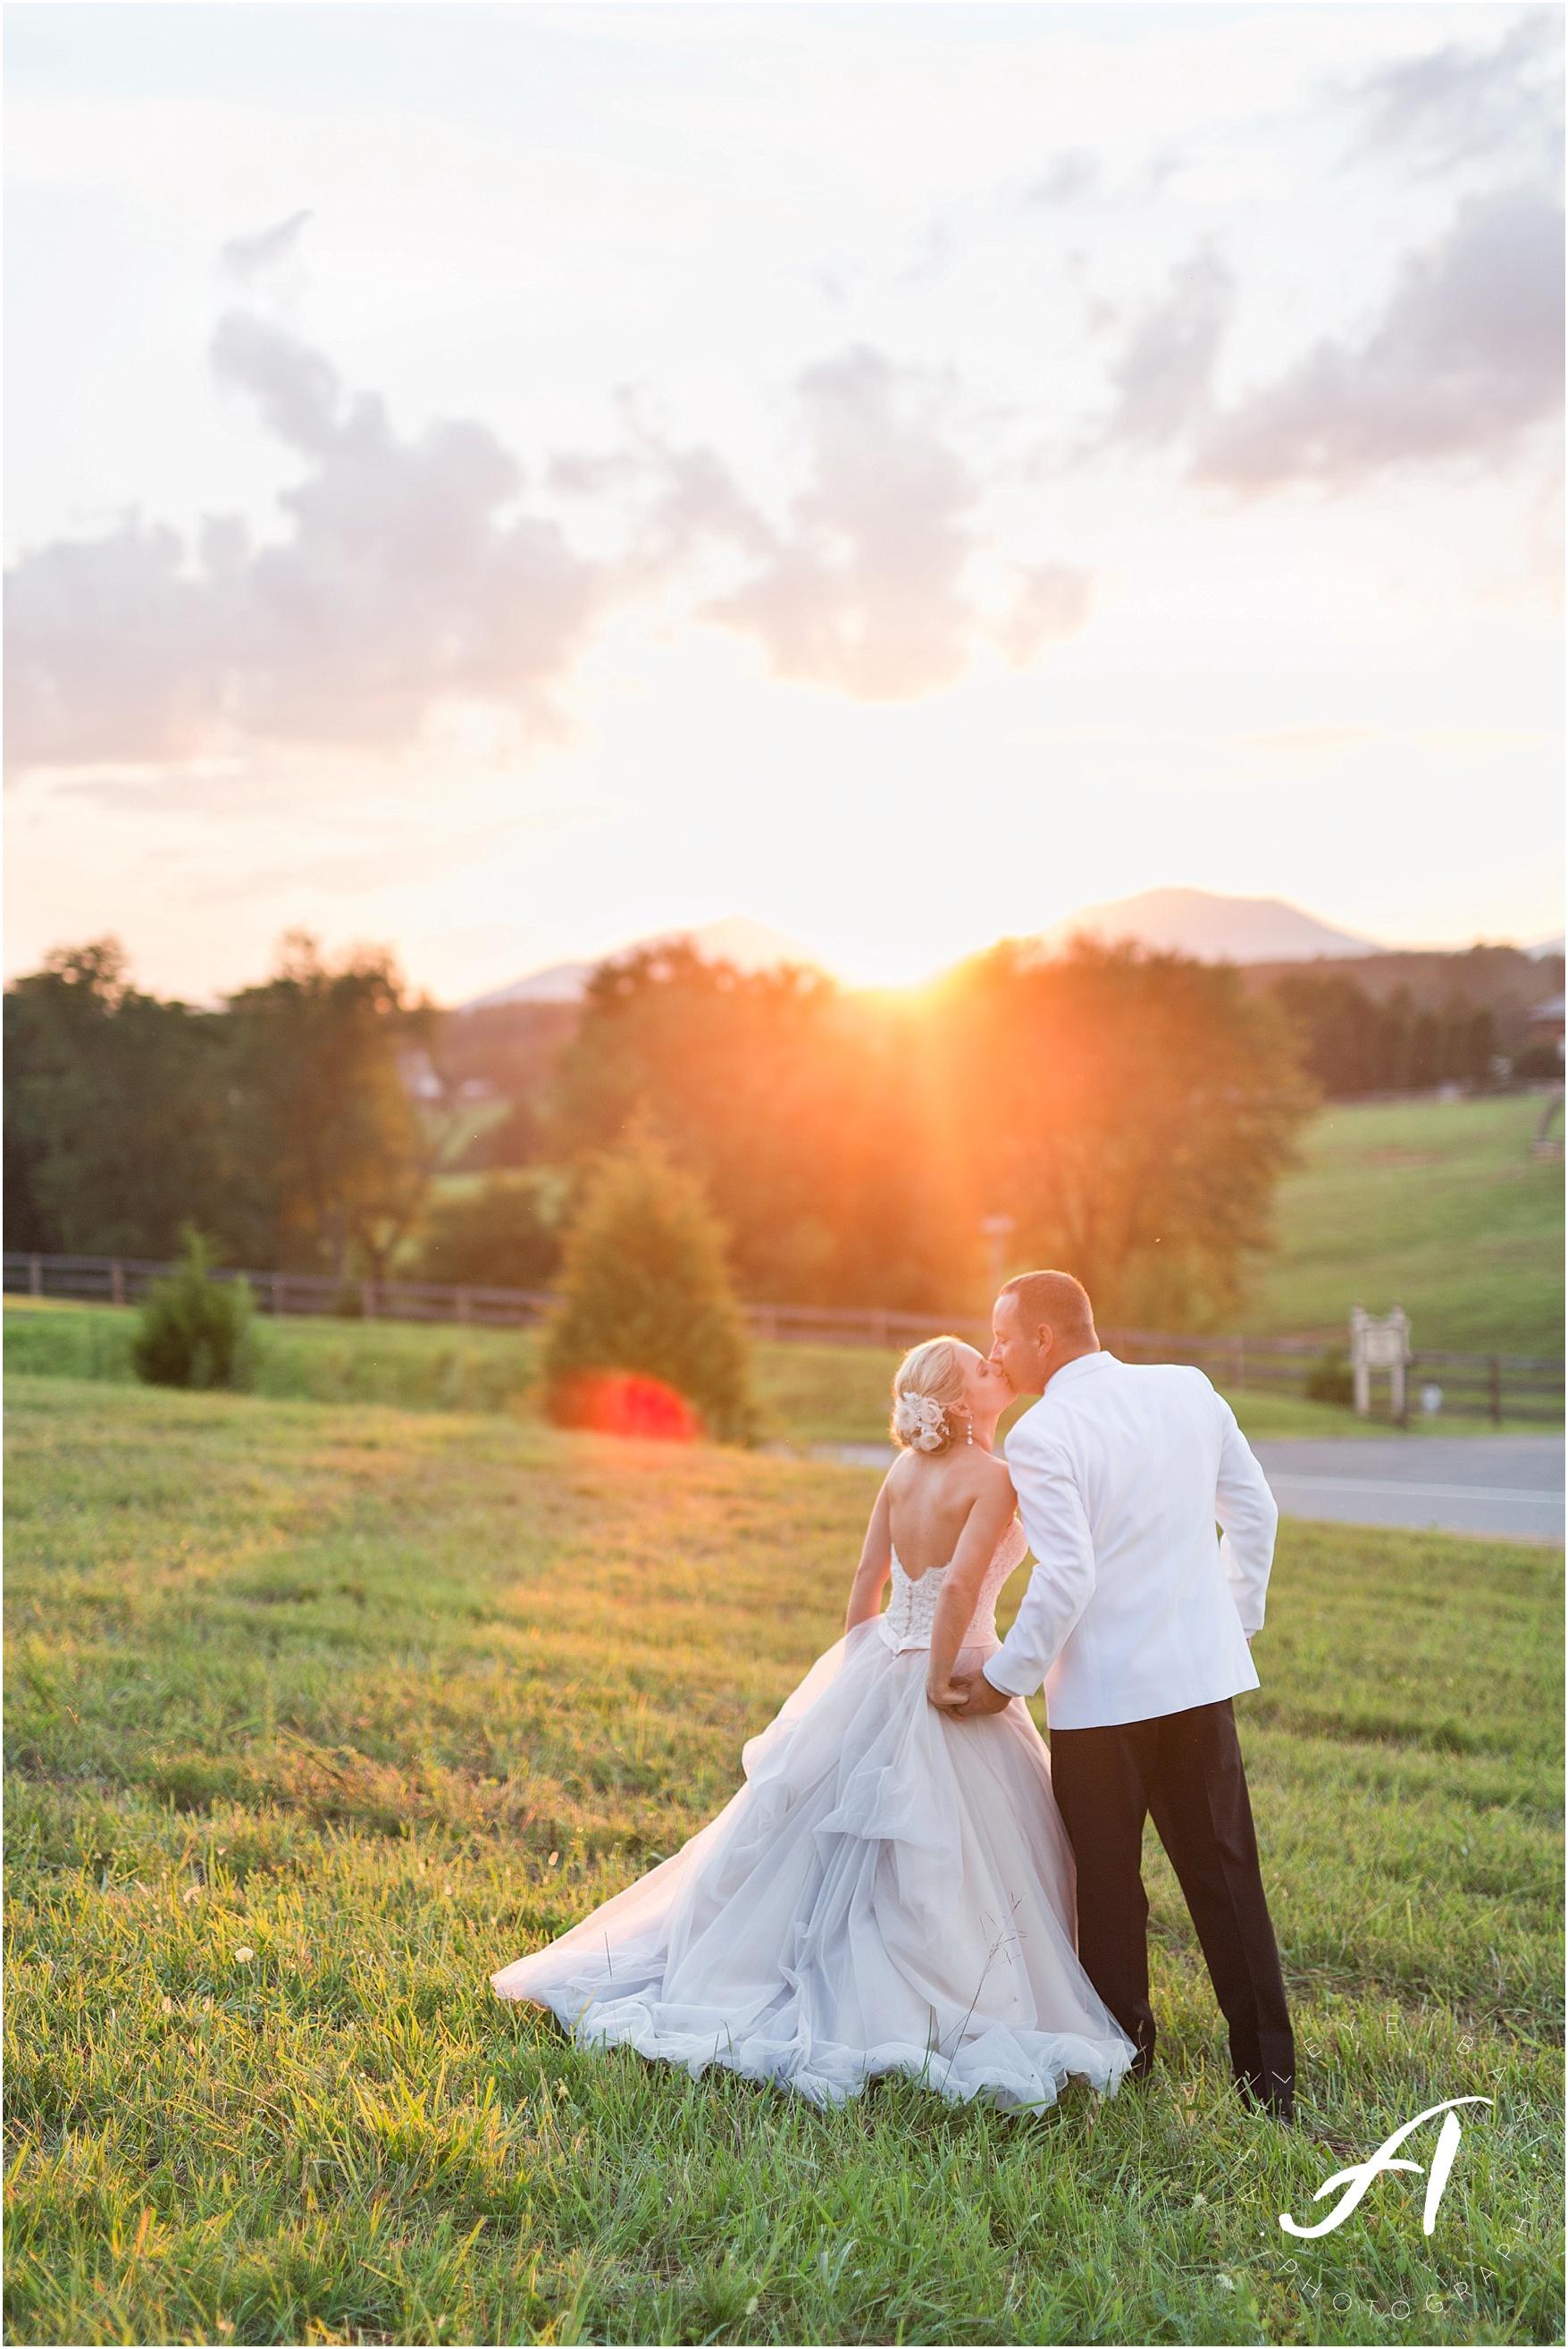 Elegant blush summer wedding at The Trivium Estates in Forest, Virginia || Ashley Eiban Photography || www.ashleyeiban.com